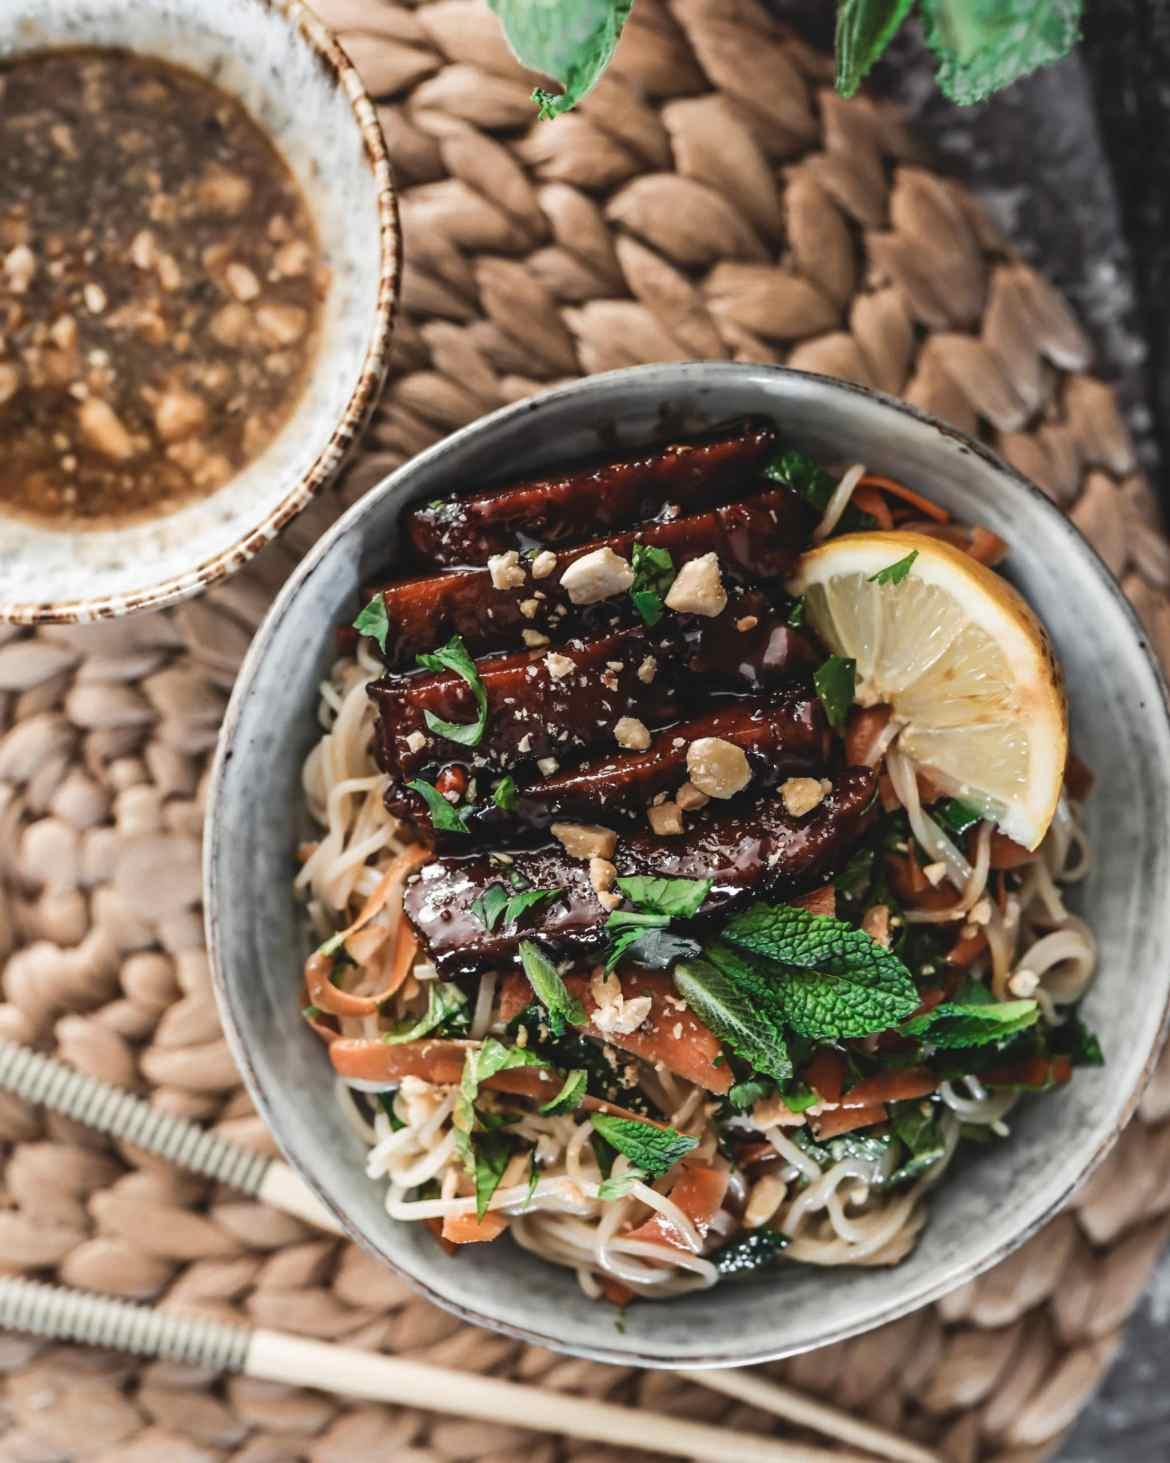 Recette salade asiatique vegan façon bo bun